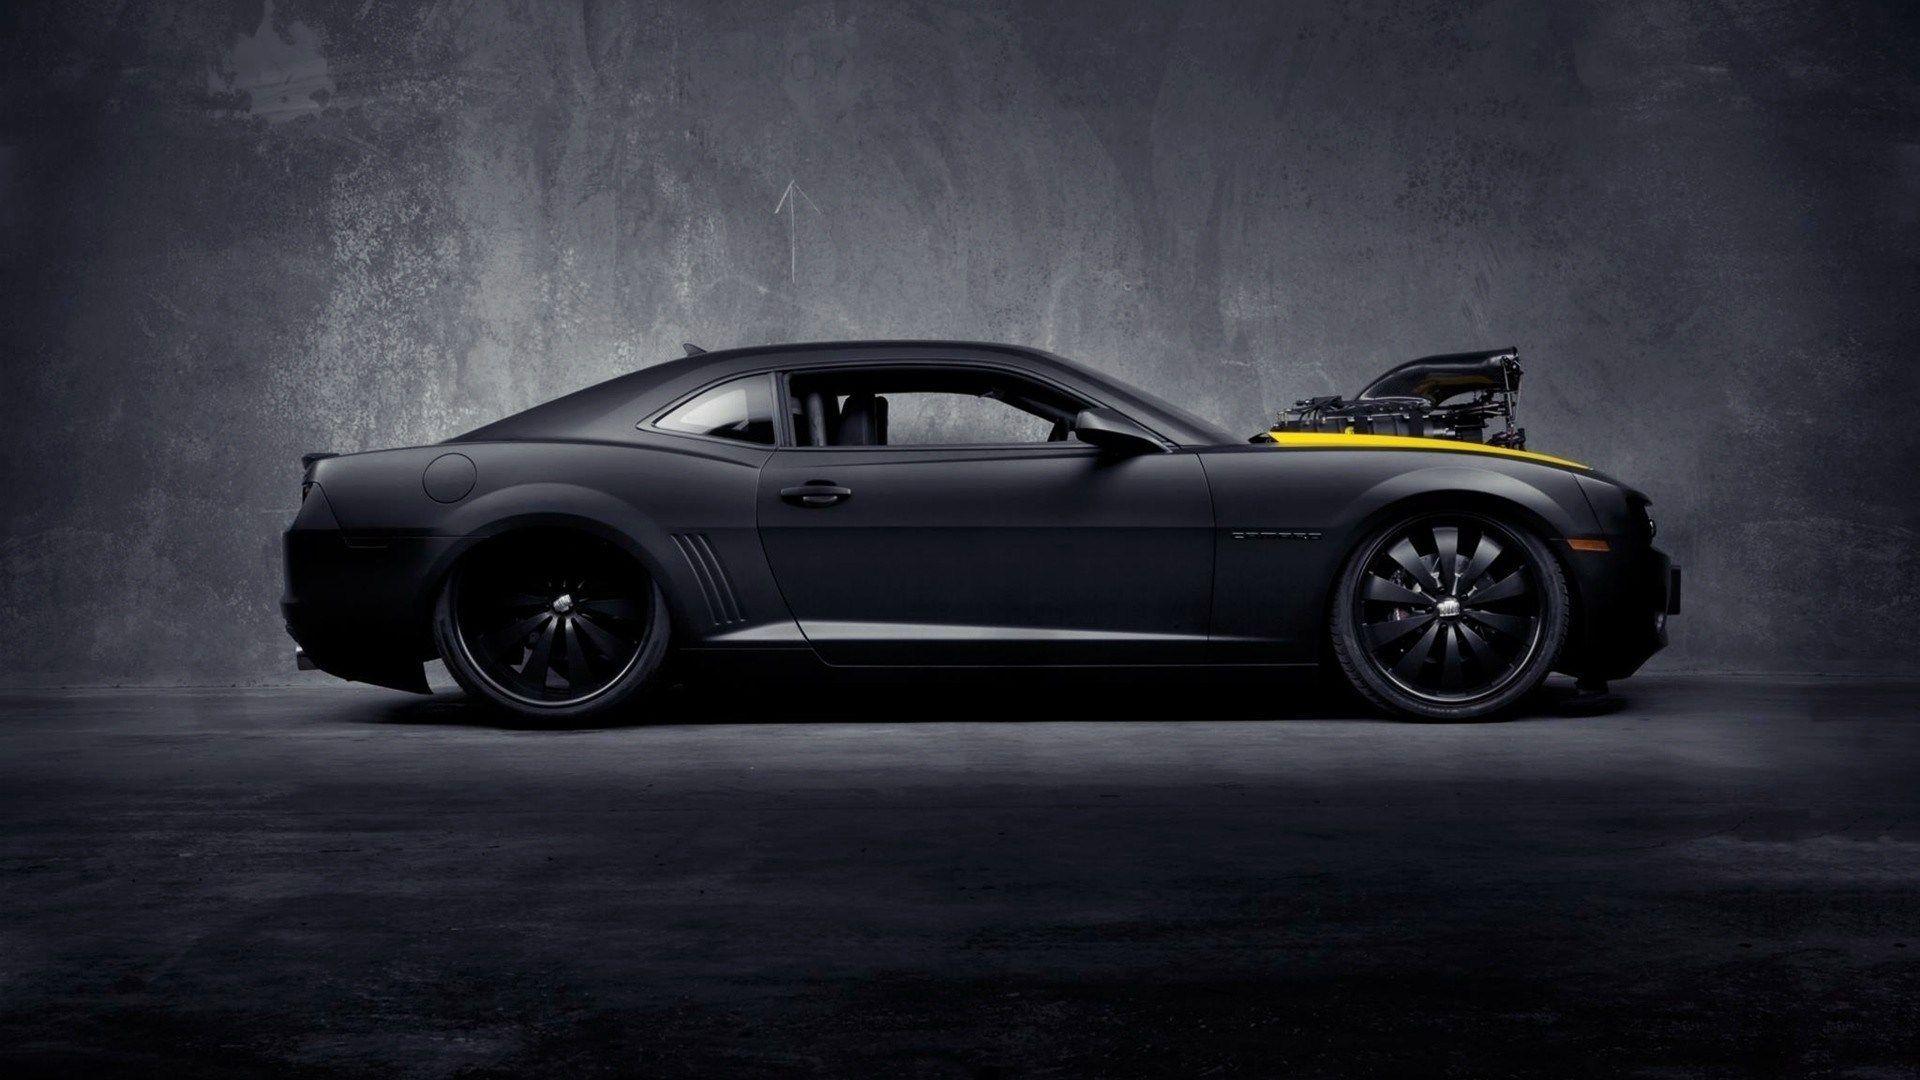 Chevrolet Camaro SS Concept Muscle Car Black Matte Side HD